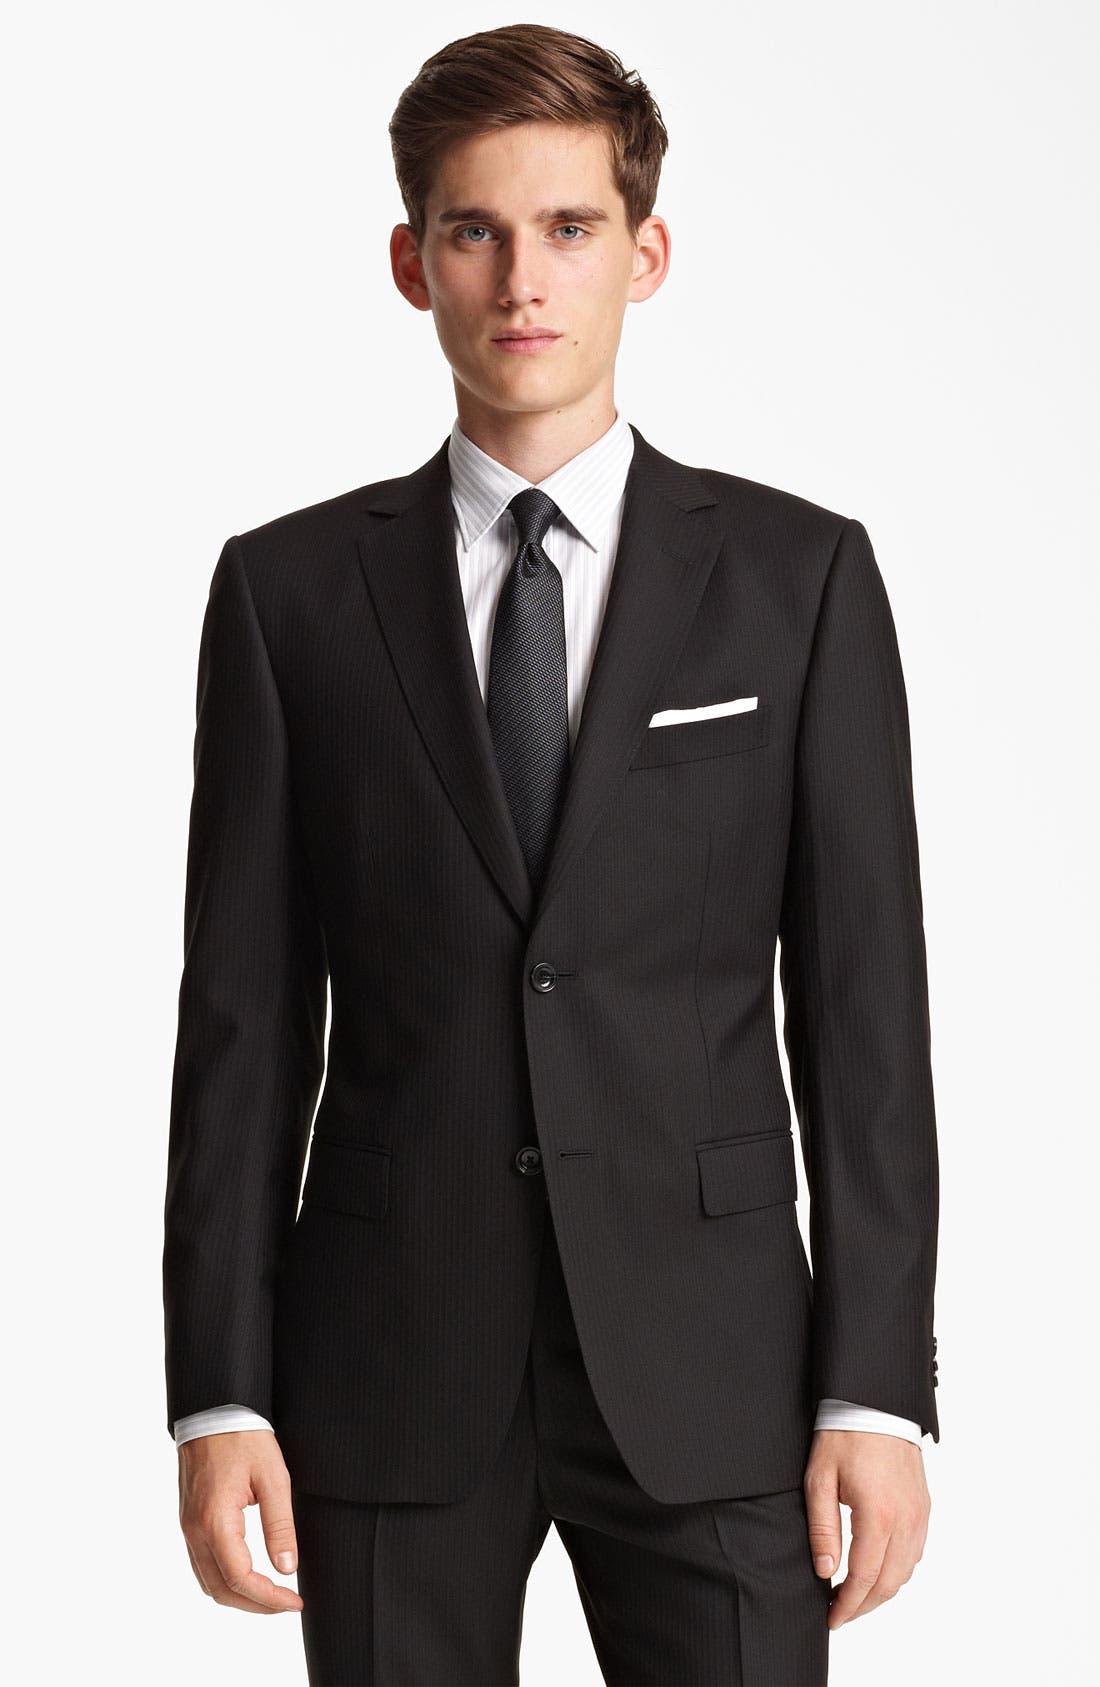 Alternate Image 1 Selected - Z Zegna Trim Fit Herringbone Suit